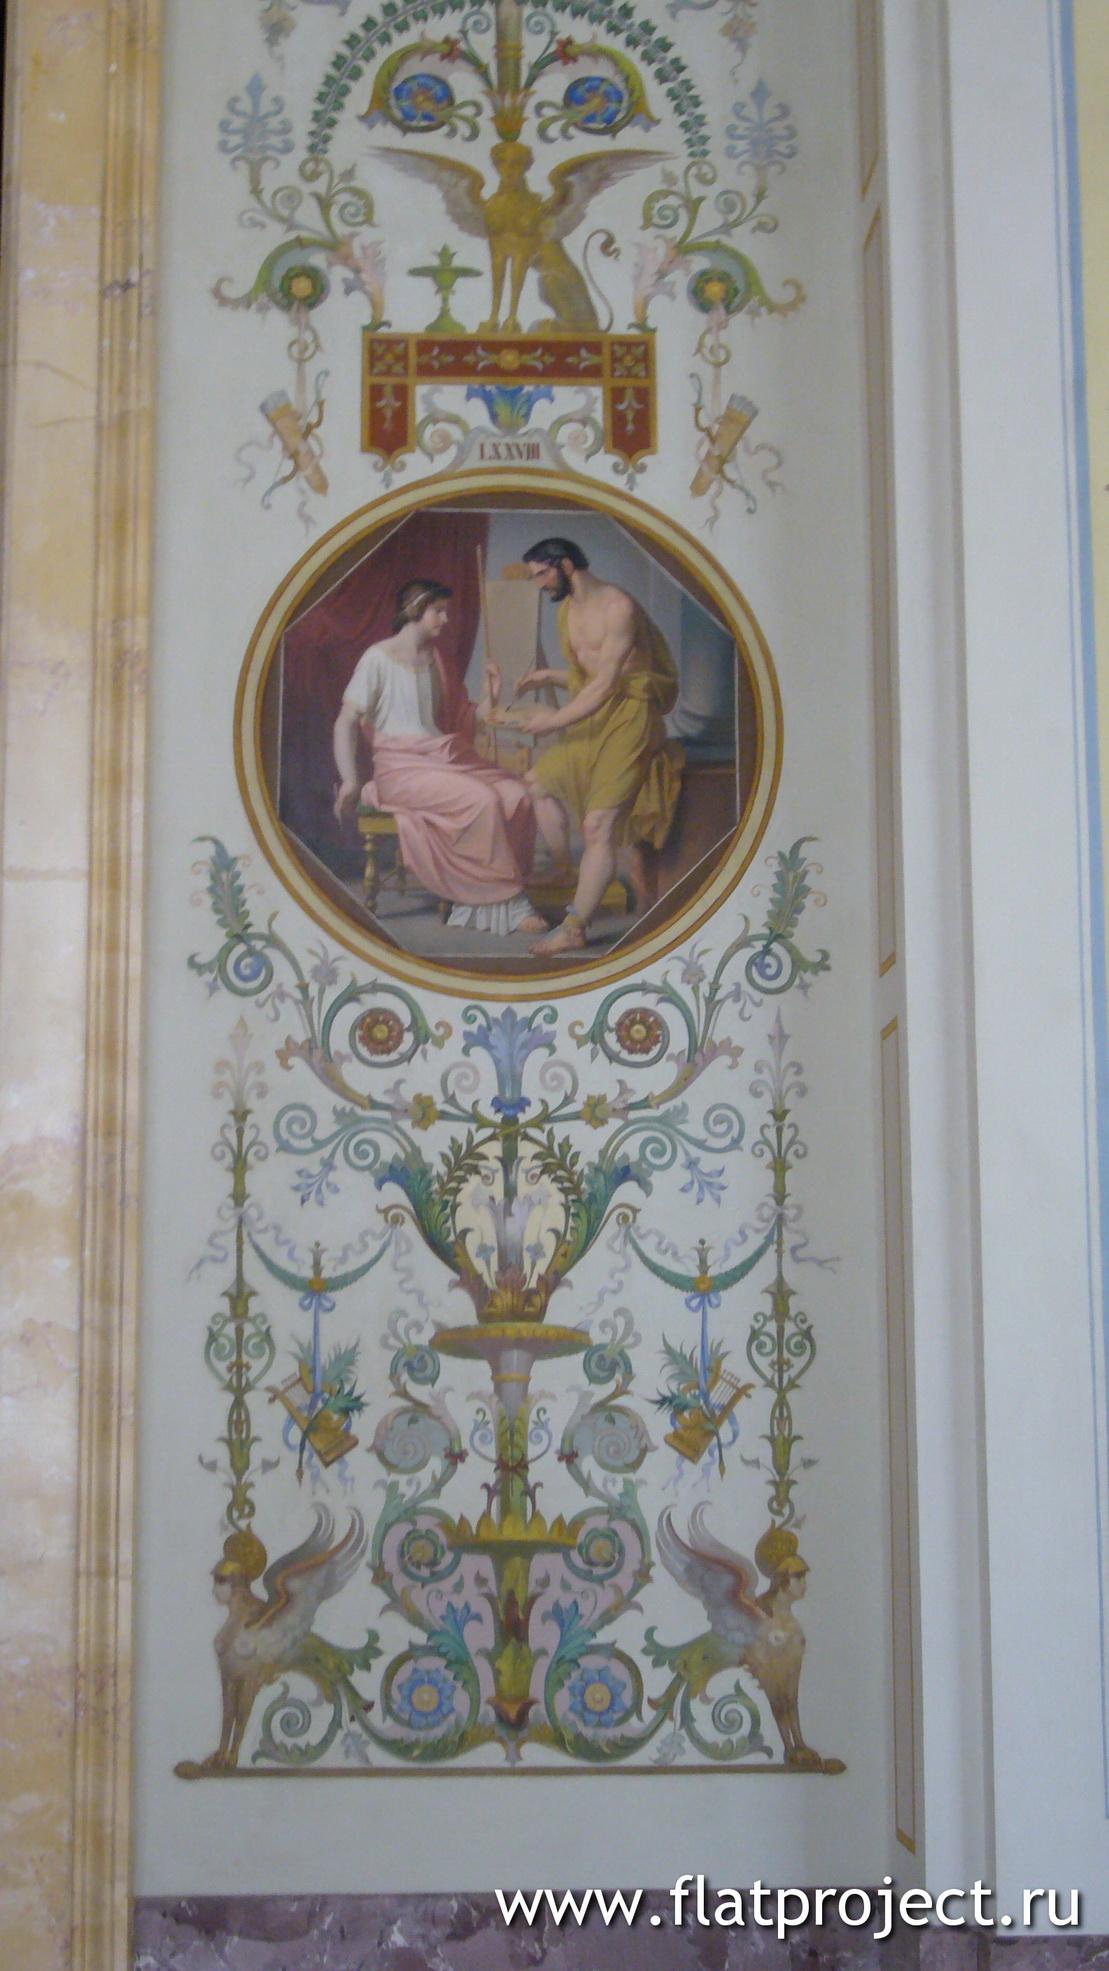 The State Hermitage museum interiors – photo 227